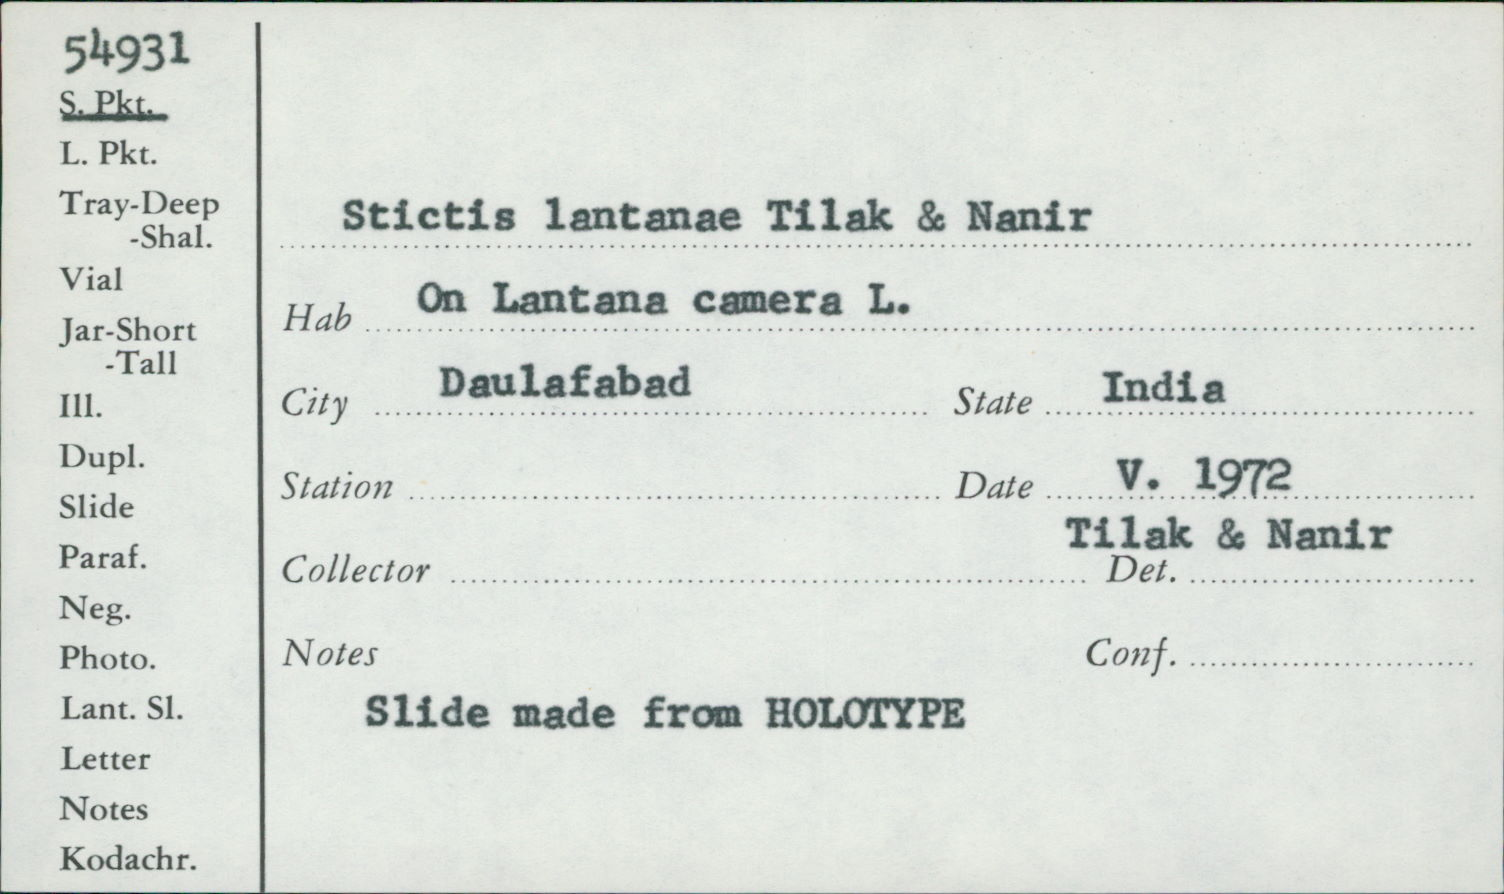 Stictis lantanae image